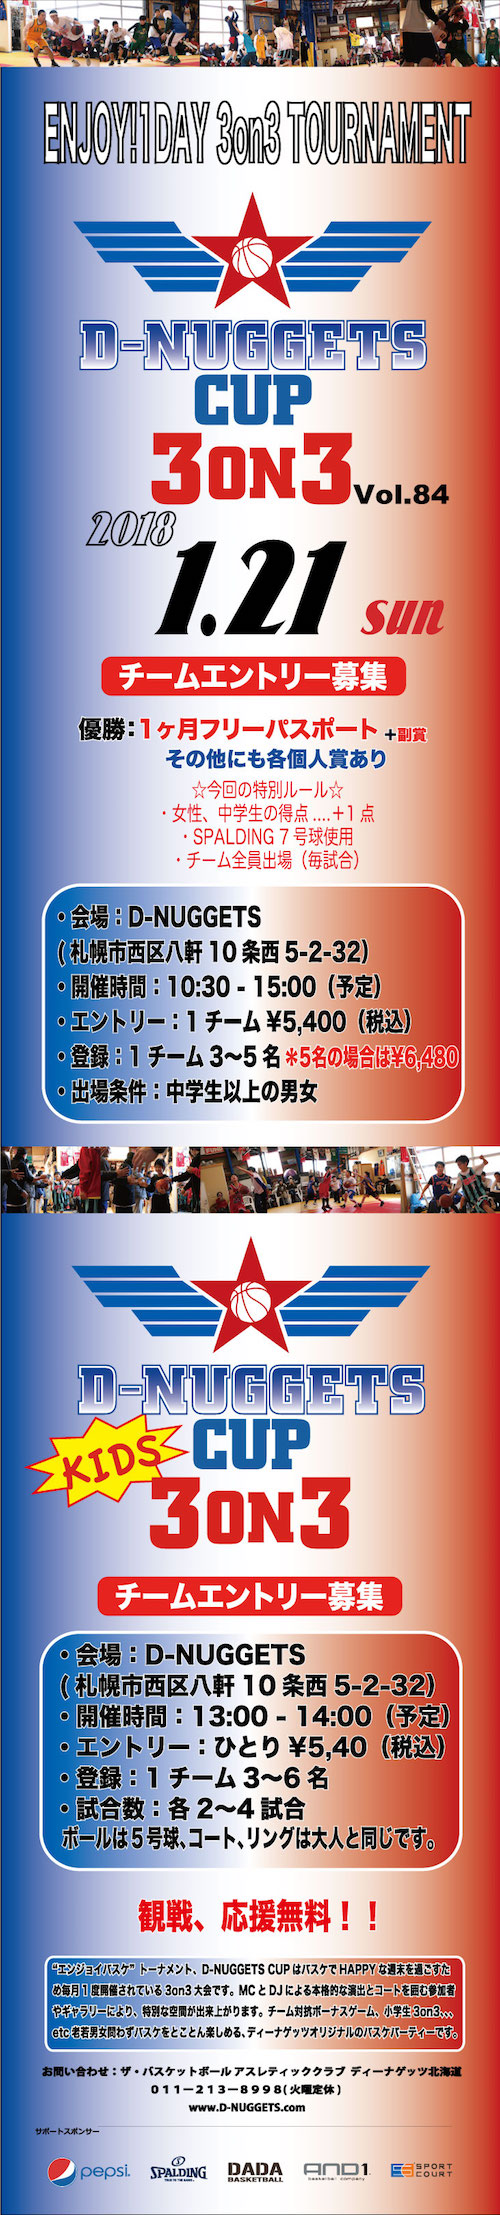 D-NUGGETS-CUP-HOKKAIDO-Vol.84.jpg